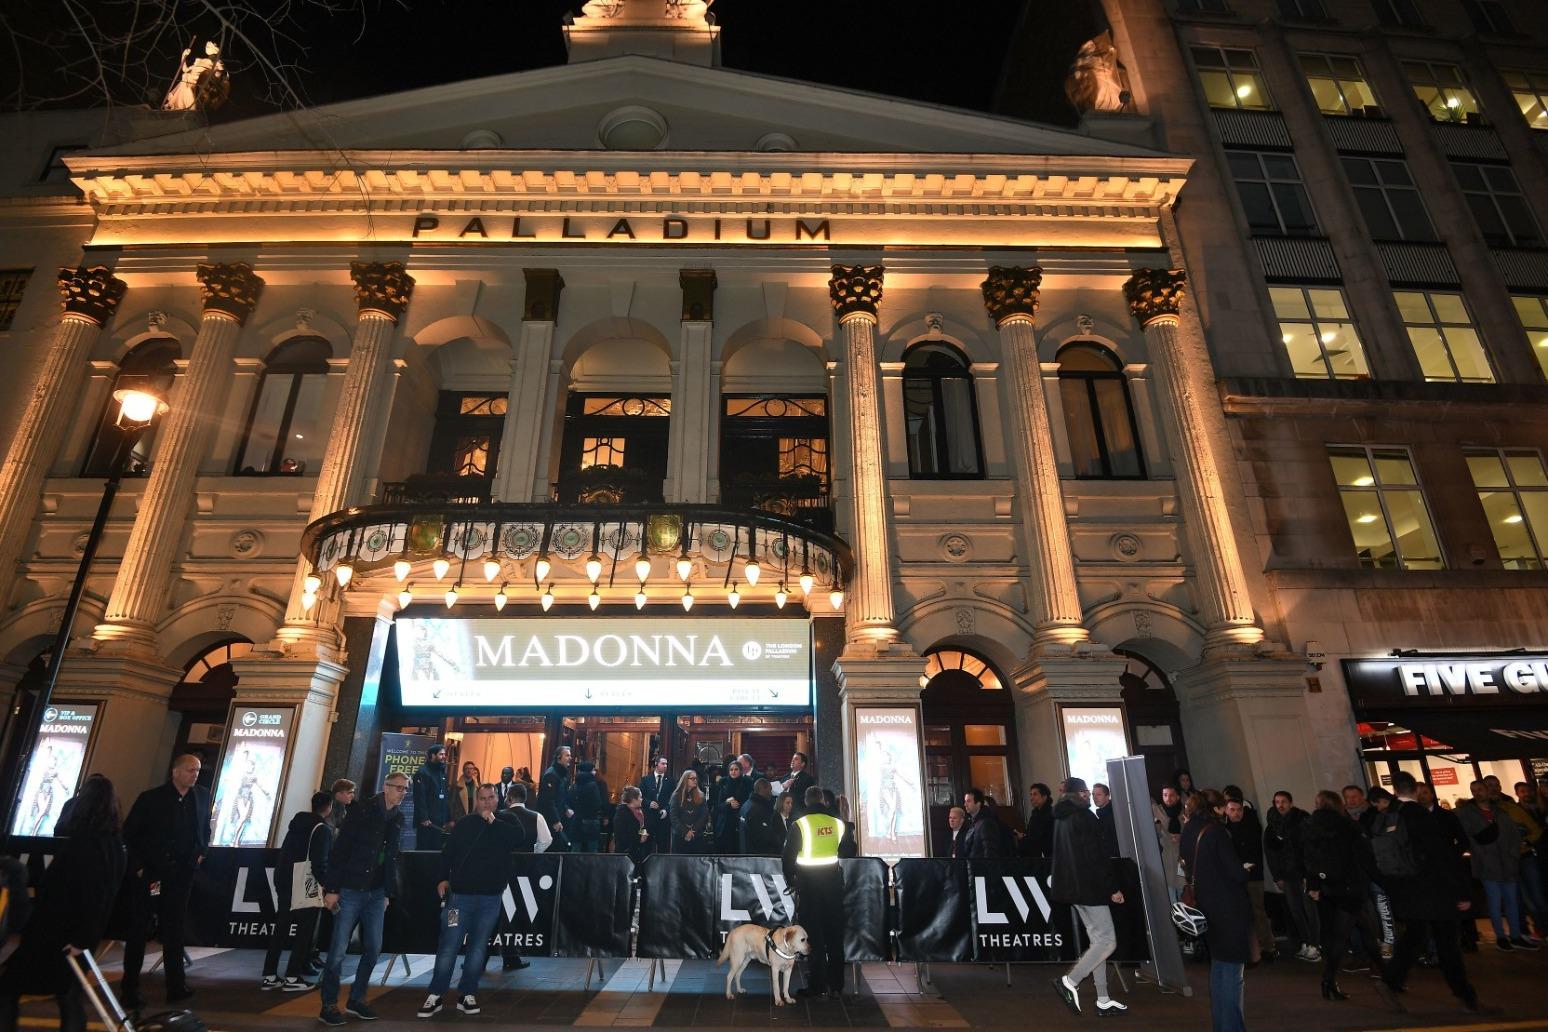 Madonna cancels London concerts